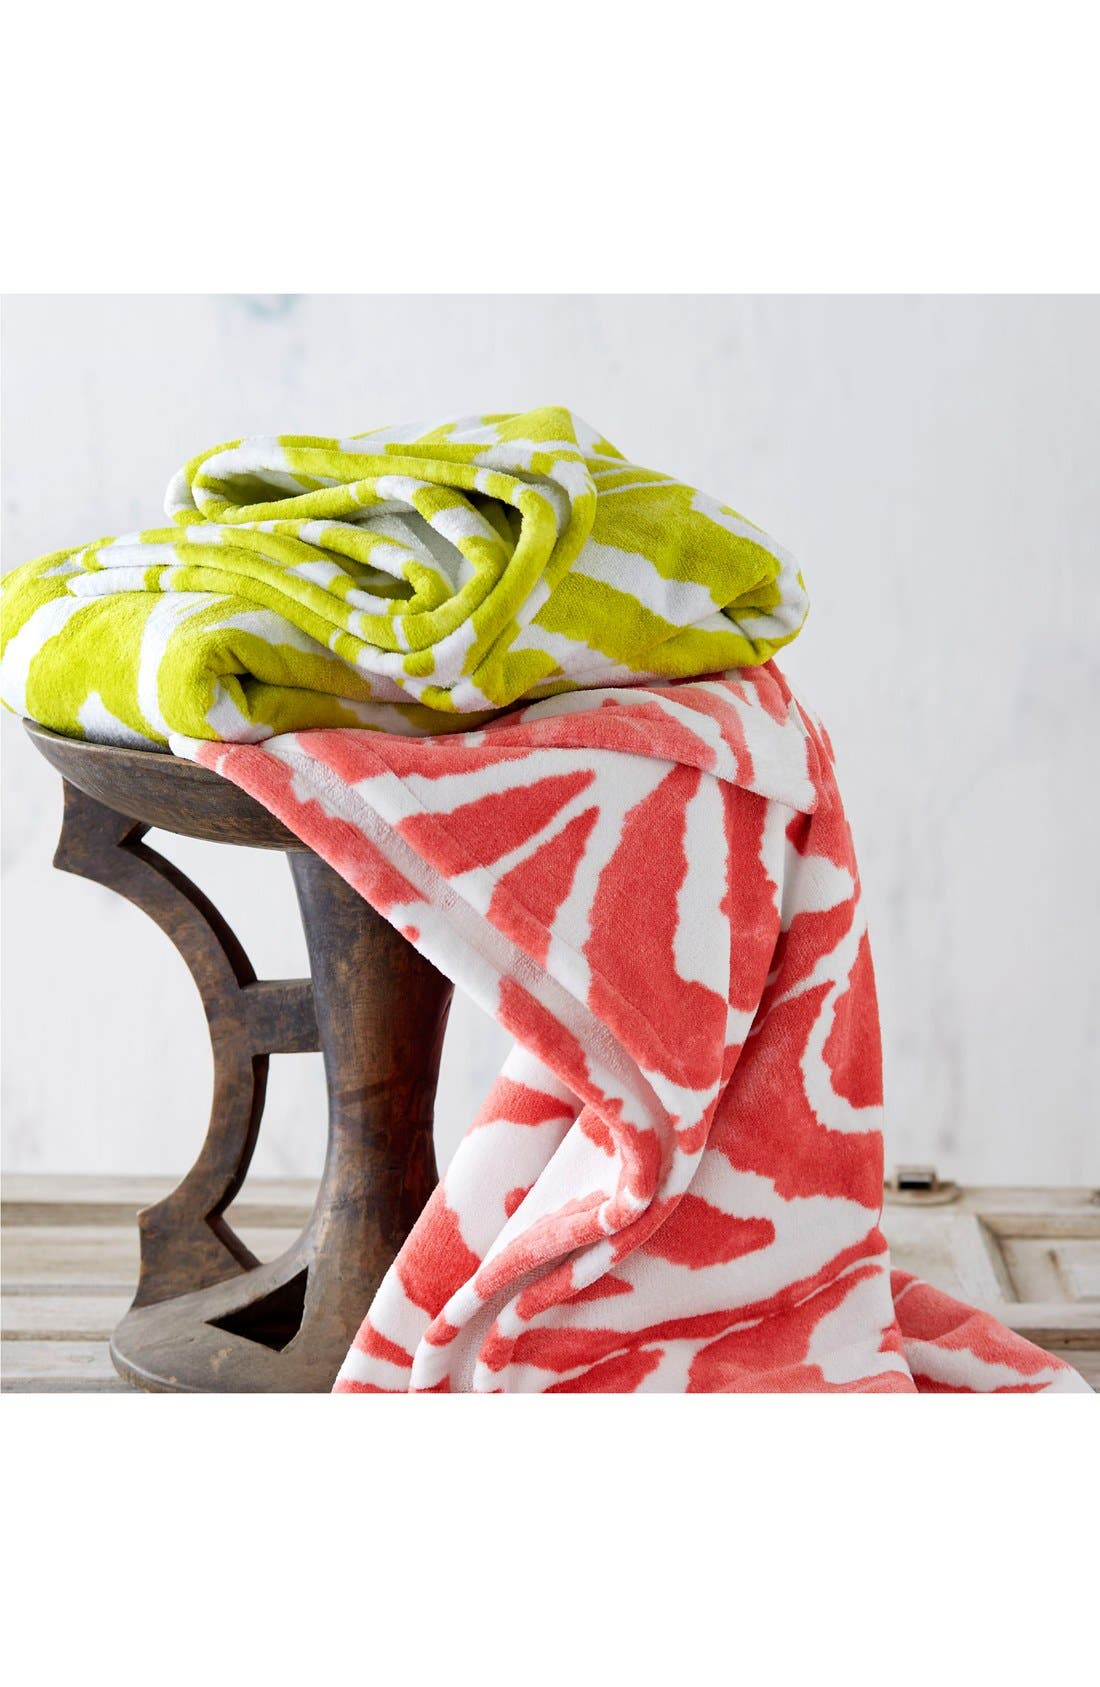 'Imrita' Wave Pattern Beach Towel,                             Alternate thumbnail 2, color,                             300